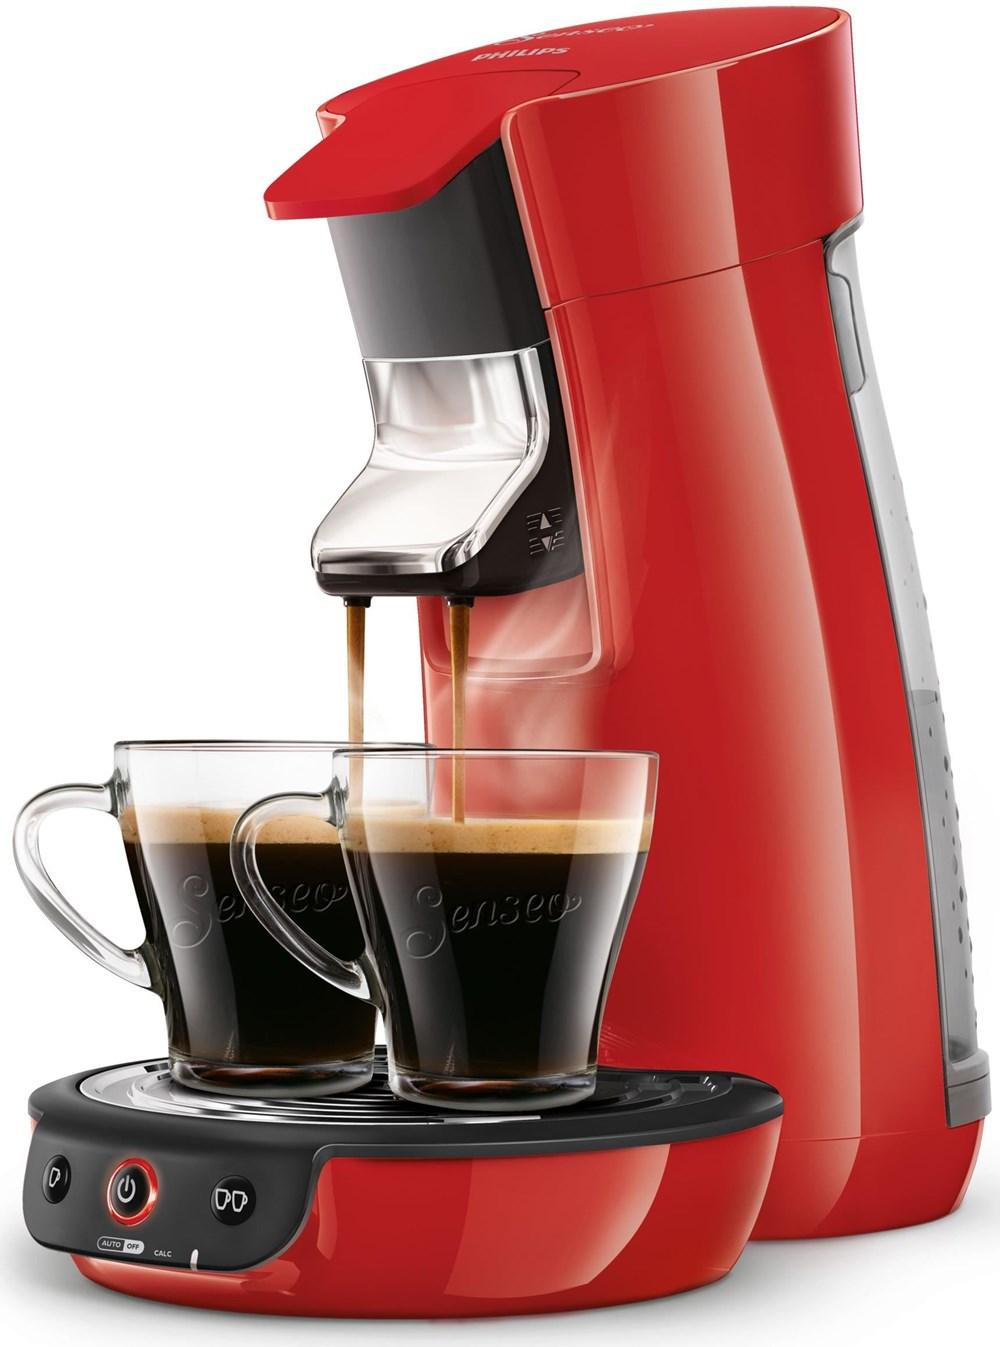 Philips HD7829/80 Senseo Viva Café rot